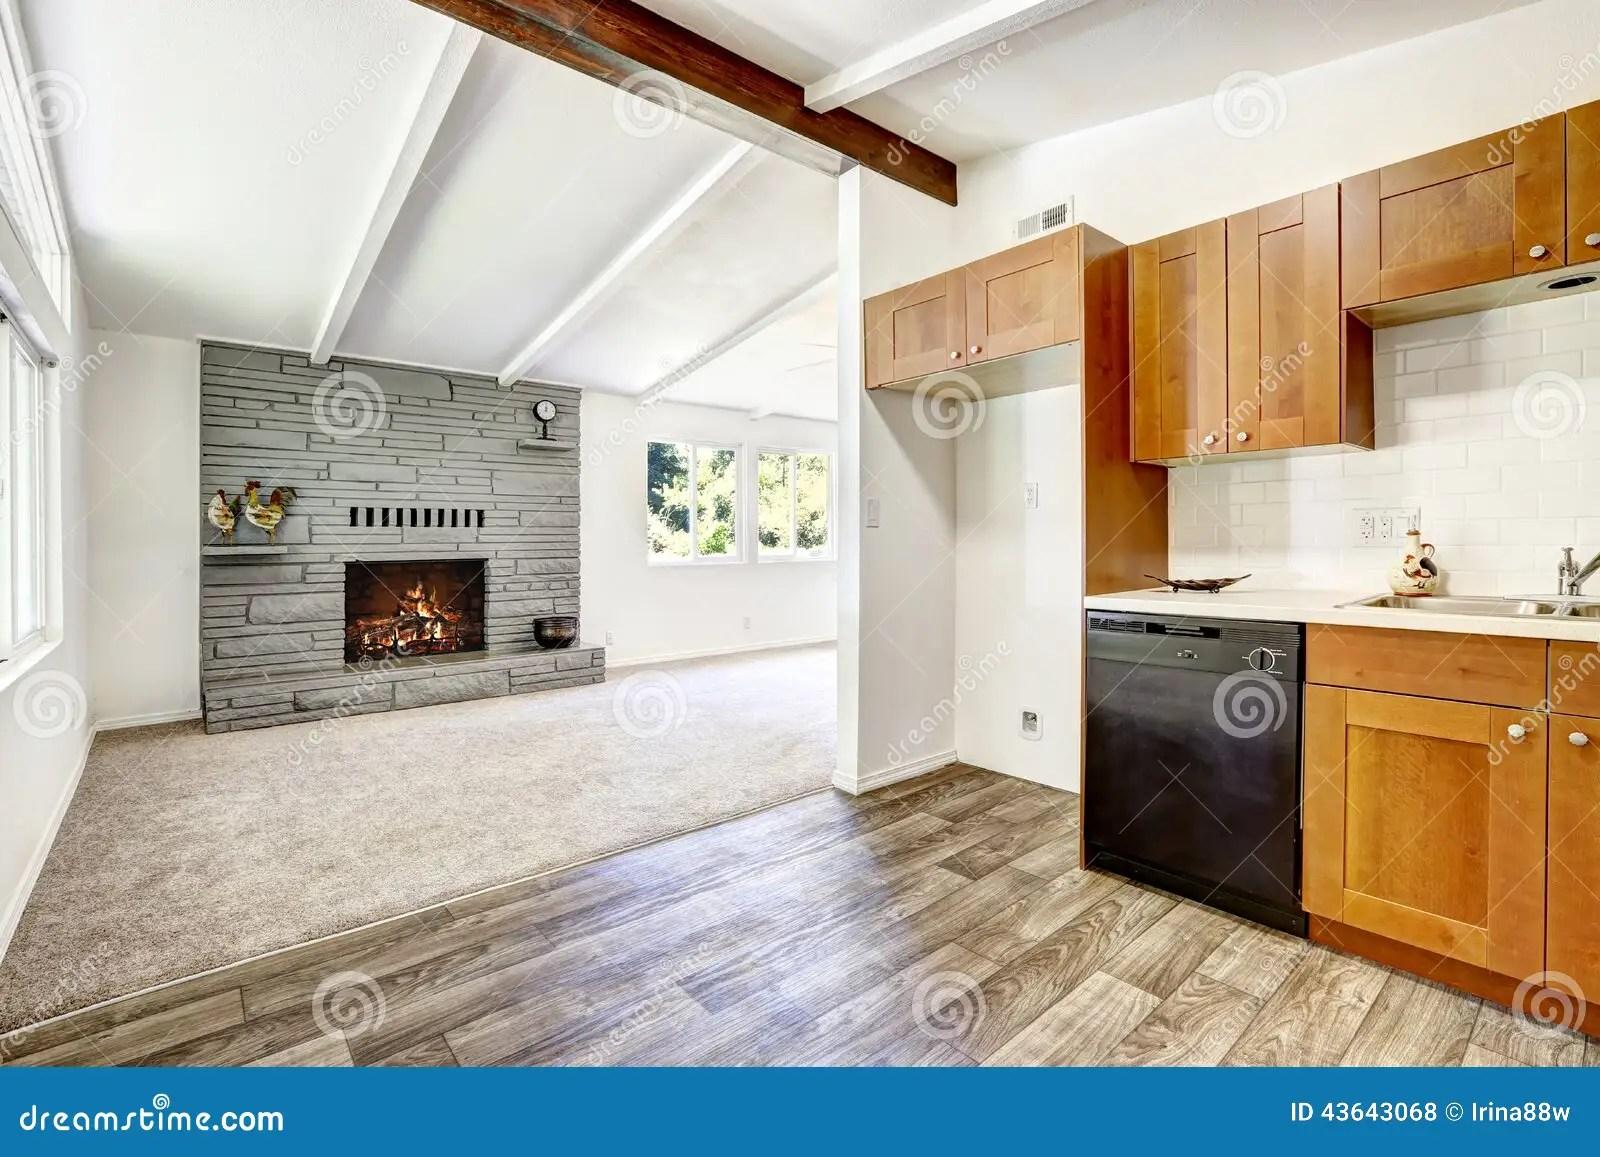 red kitchen chairs remodling 椅子门入口房子内部现代红色厨房和客厅库存照片 图片包括有机柜 干净 有黑装置的厨柜和白色瓦片墙壁整理空的客厅看法有壁炉的